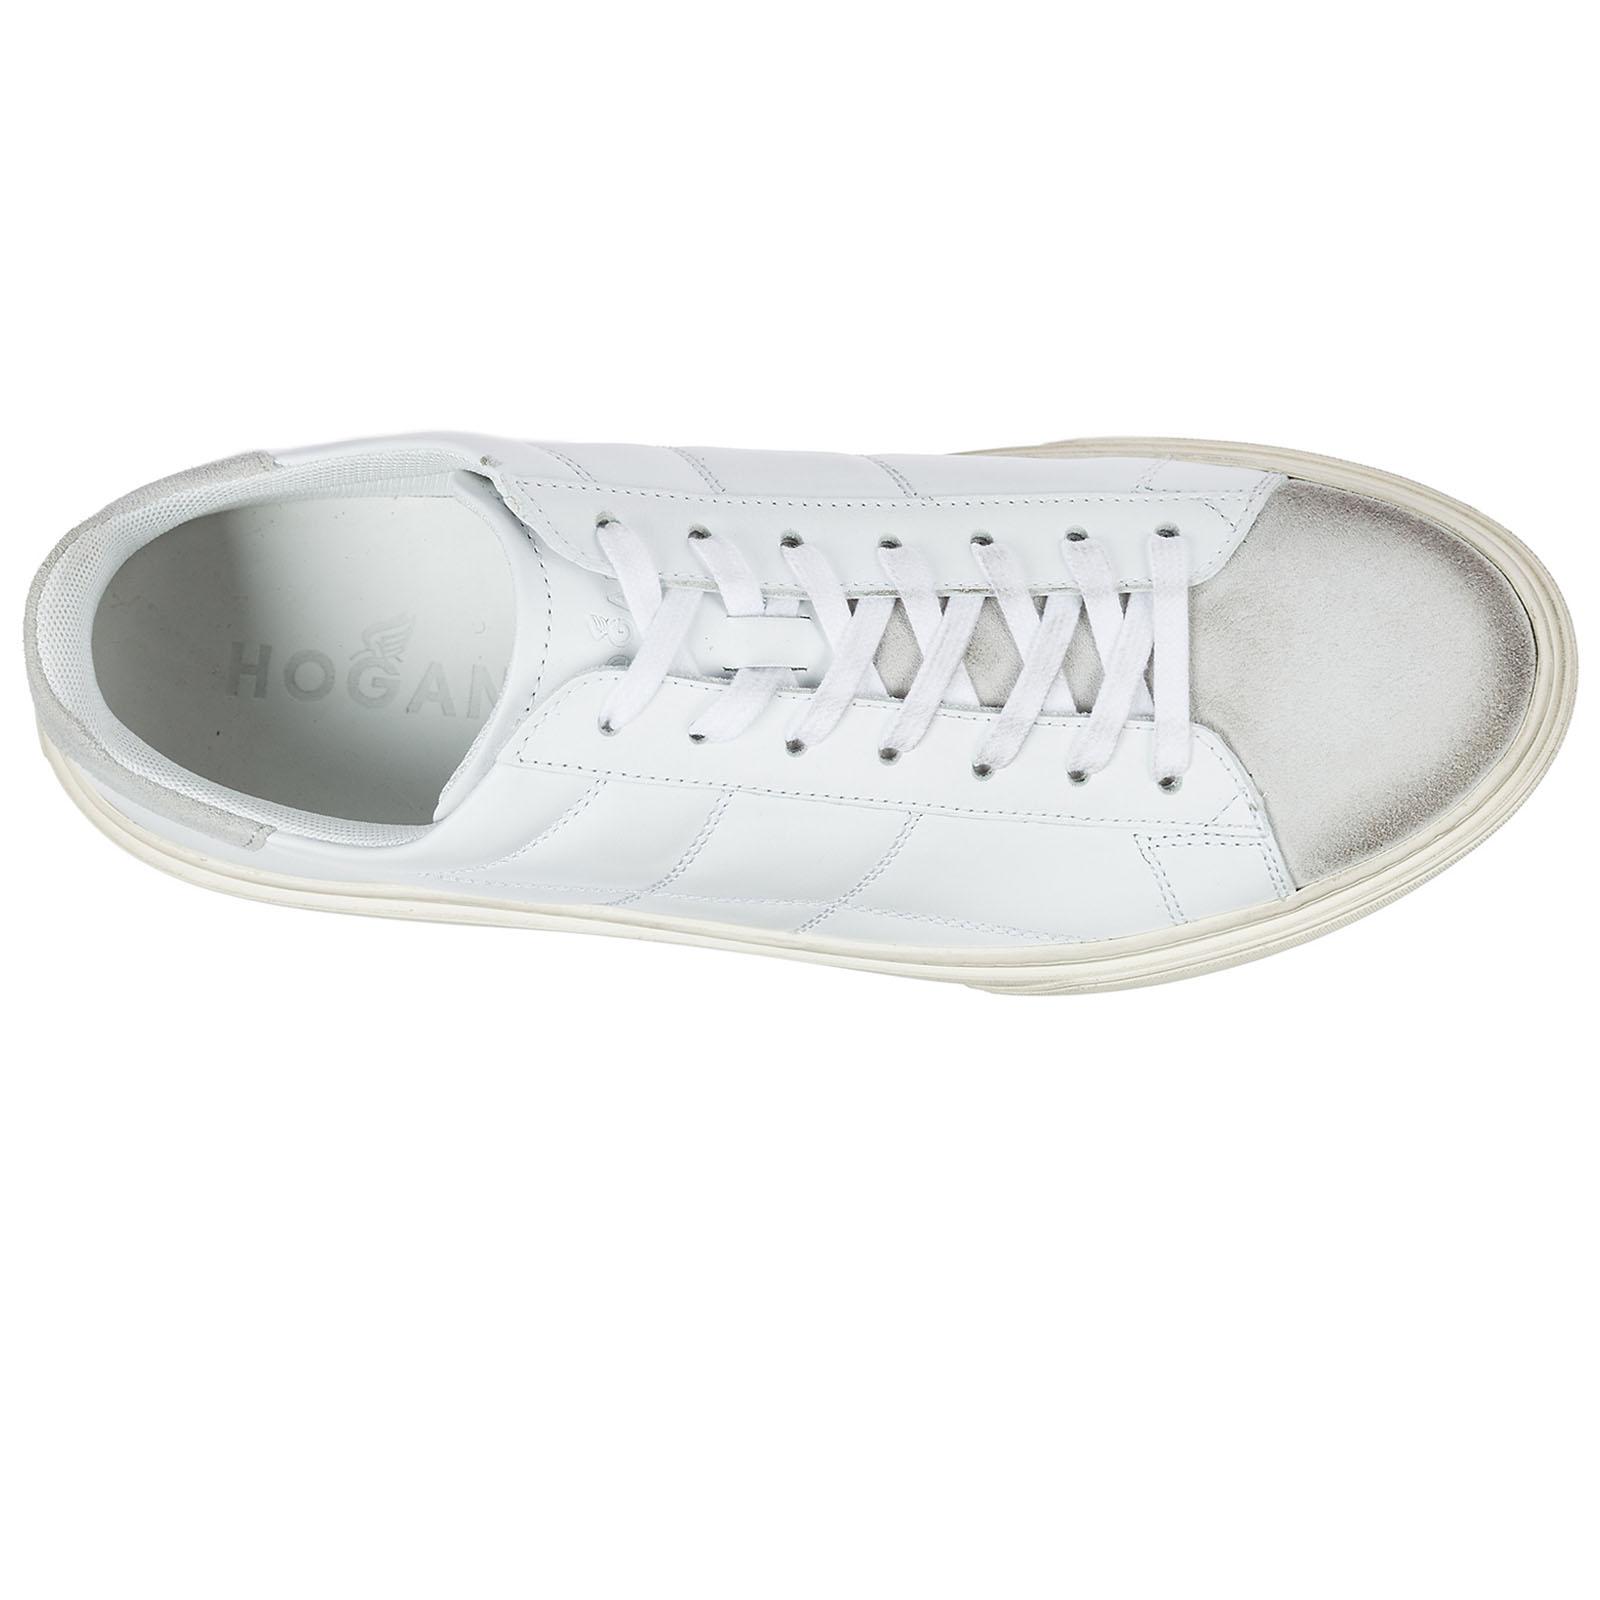 Scarpe sneakers uomo in pelle h340